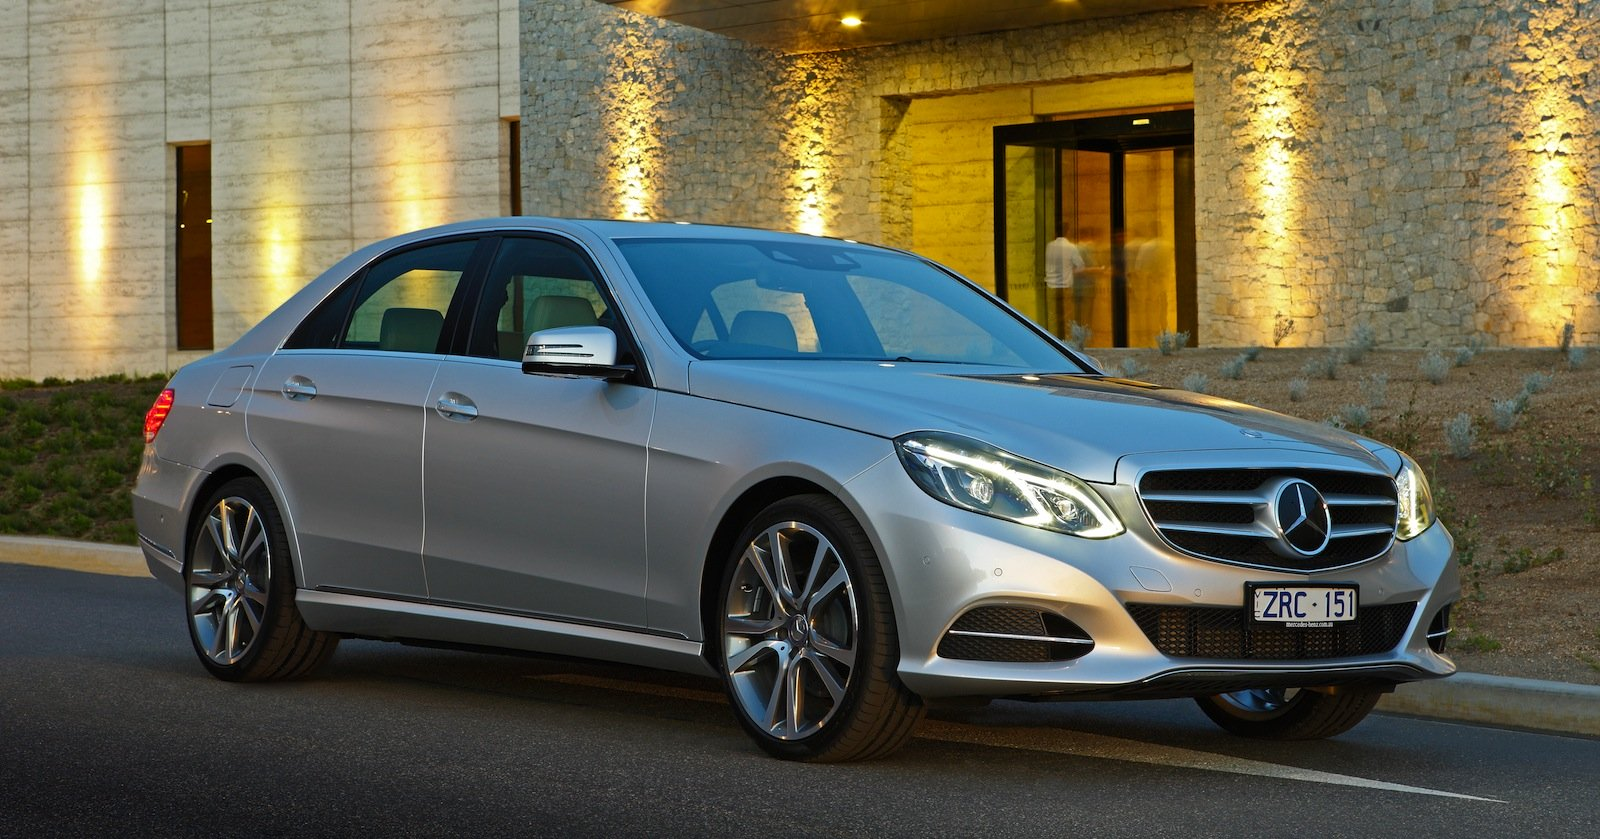 2015 mercedes benz e class image 6 for Mercedes benz 2015 e class